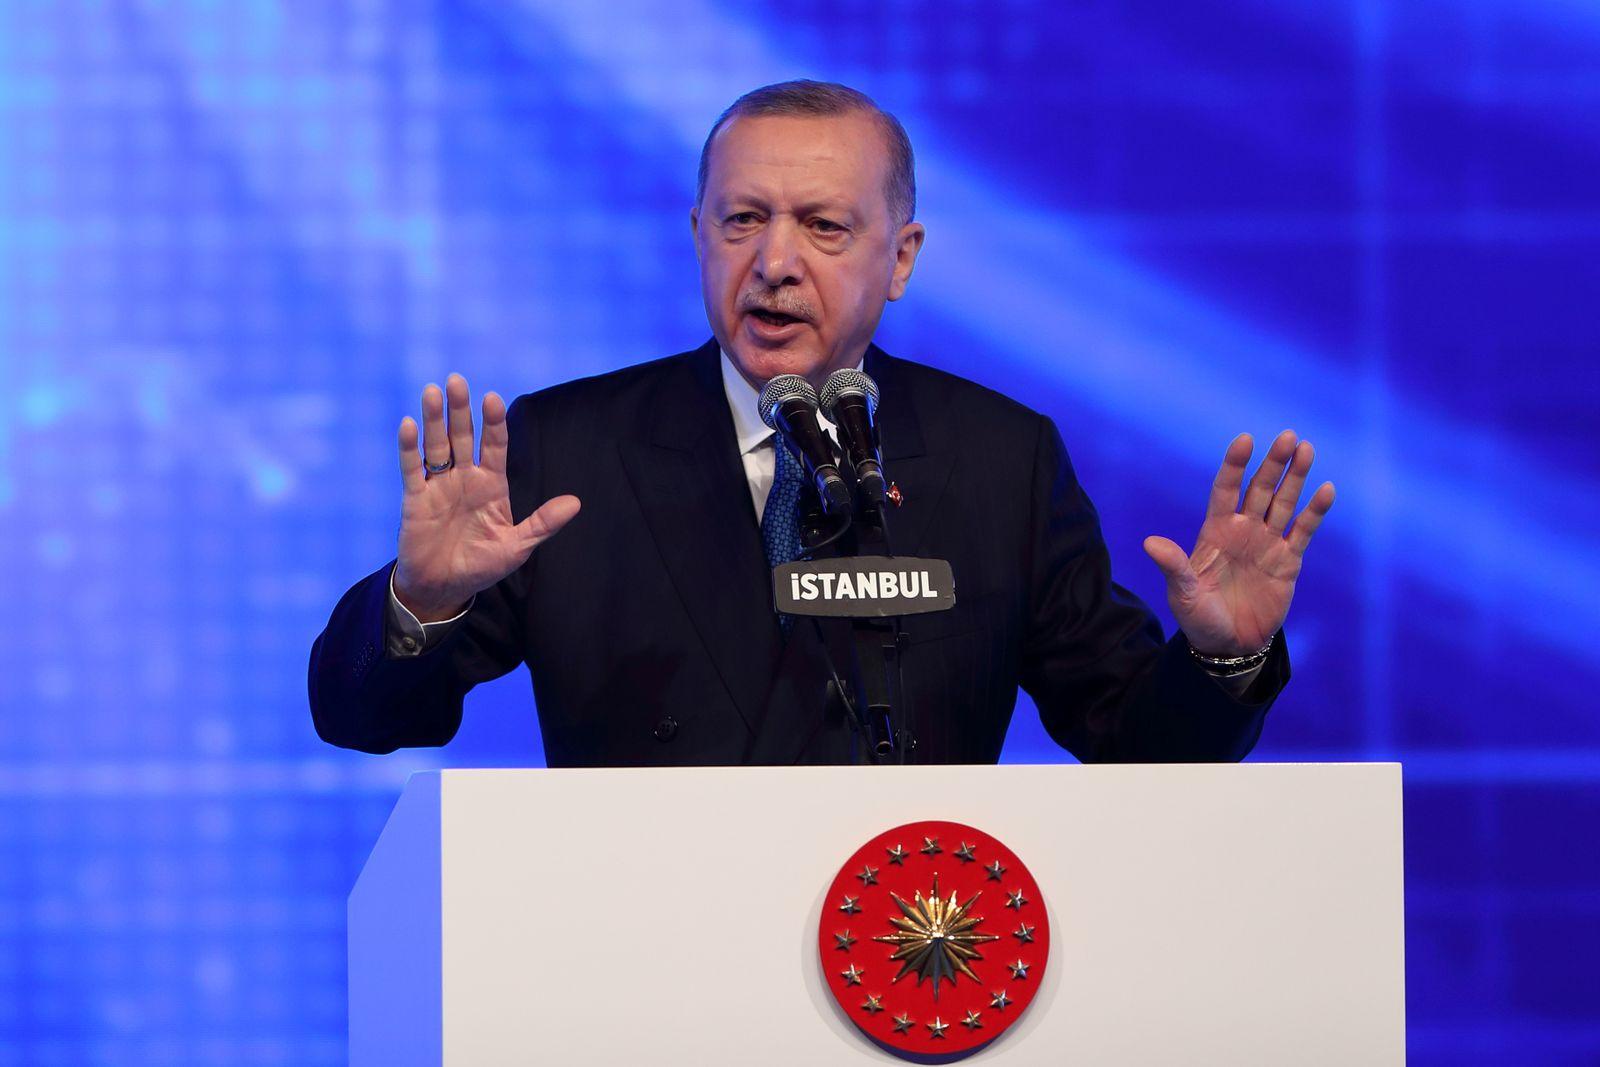 FILE PHOTO: Turkish President Erdogan announces economic reforms in Istanbul